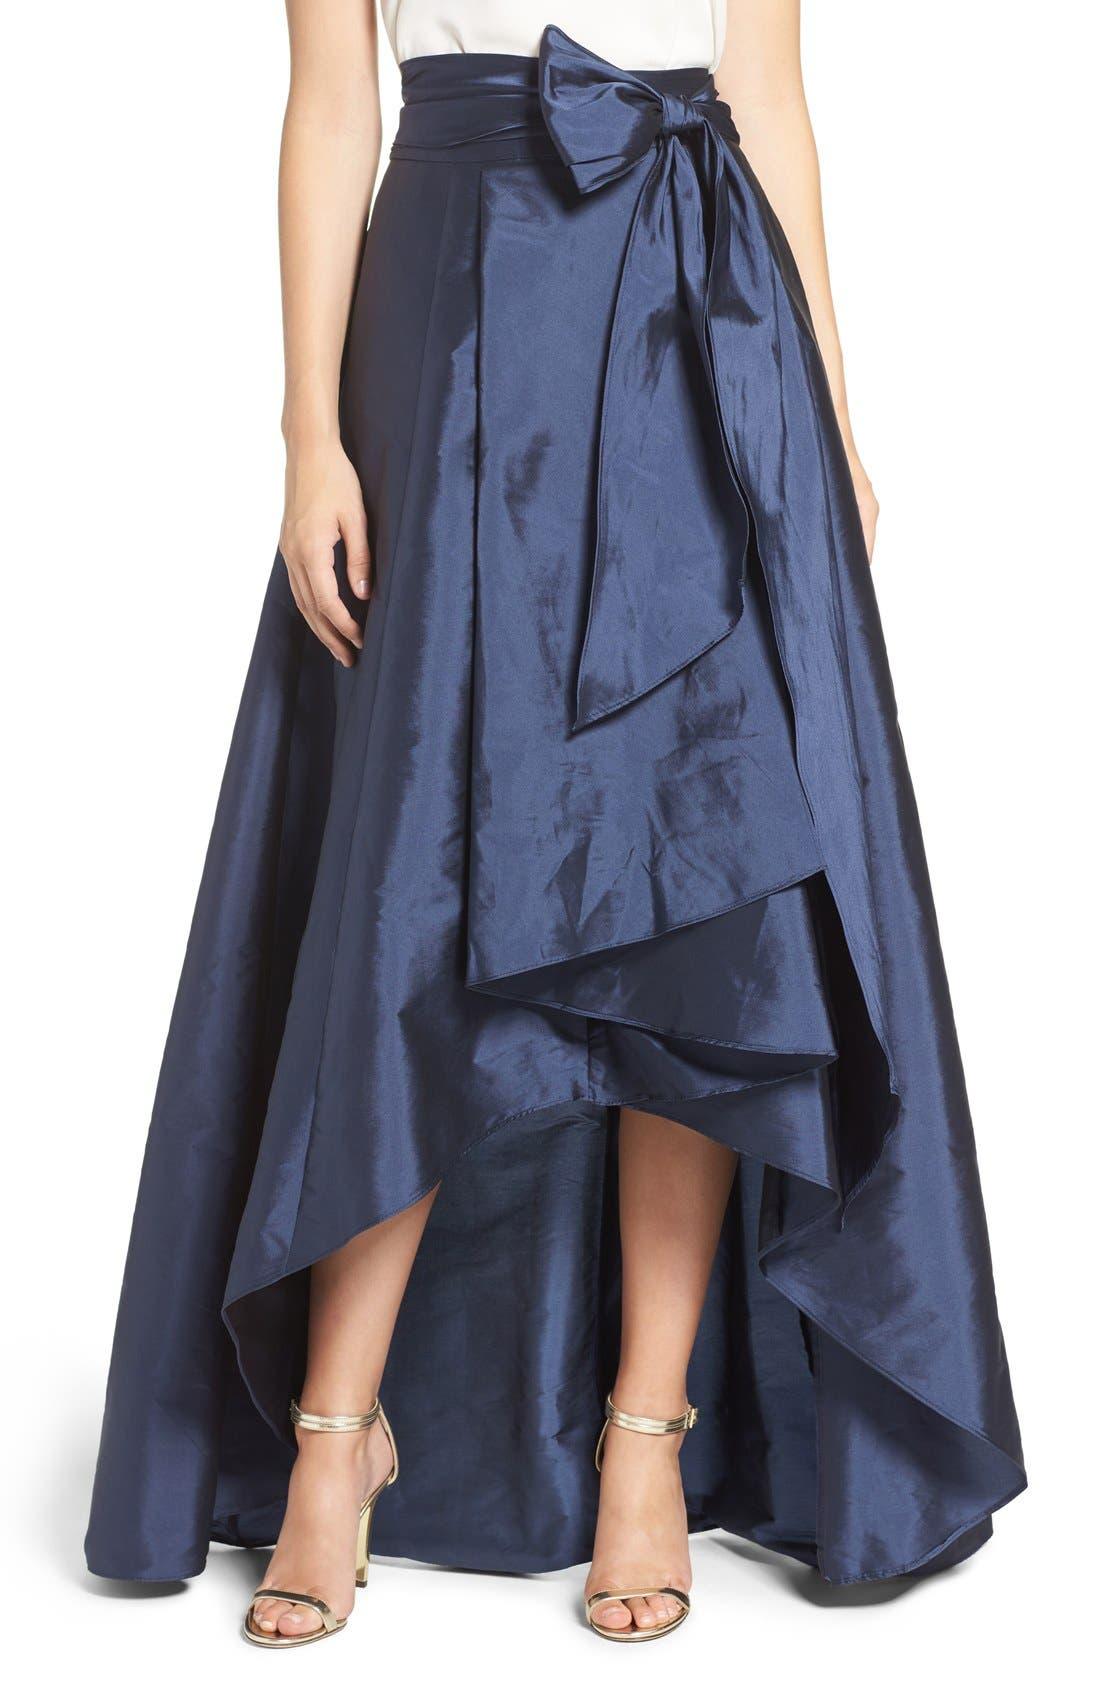 Alternate Image 1 Selected - Adrianna Papell High/Low Taffeta Ball Skirt